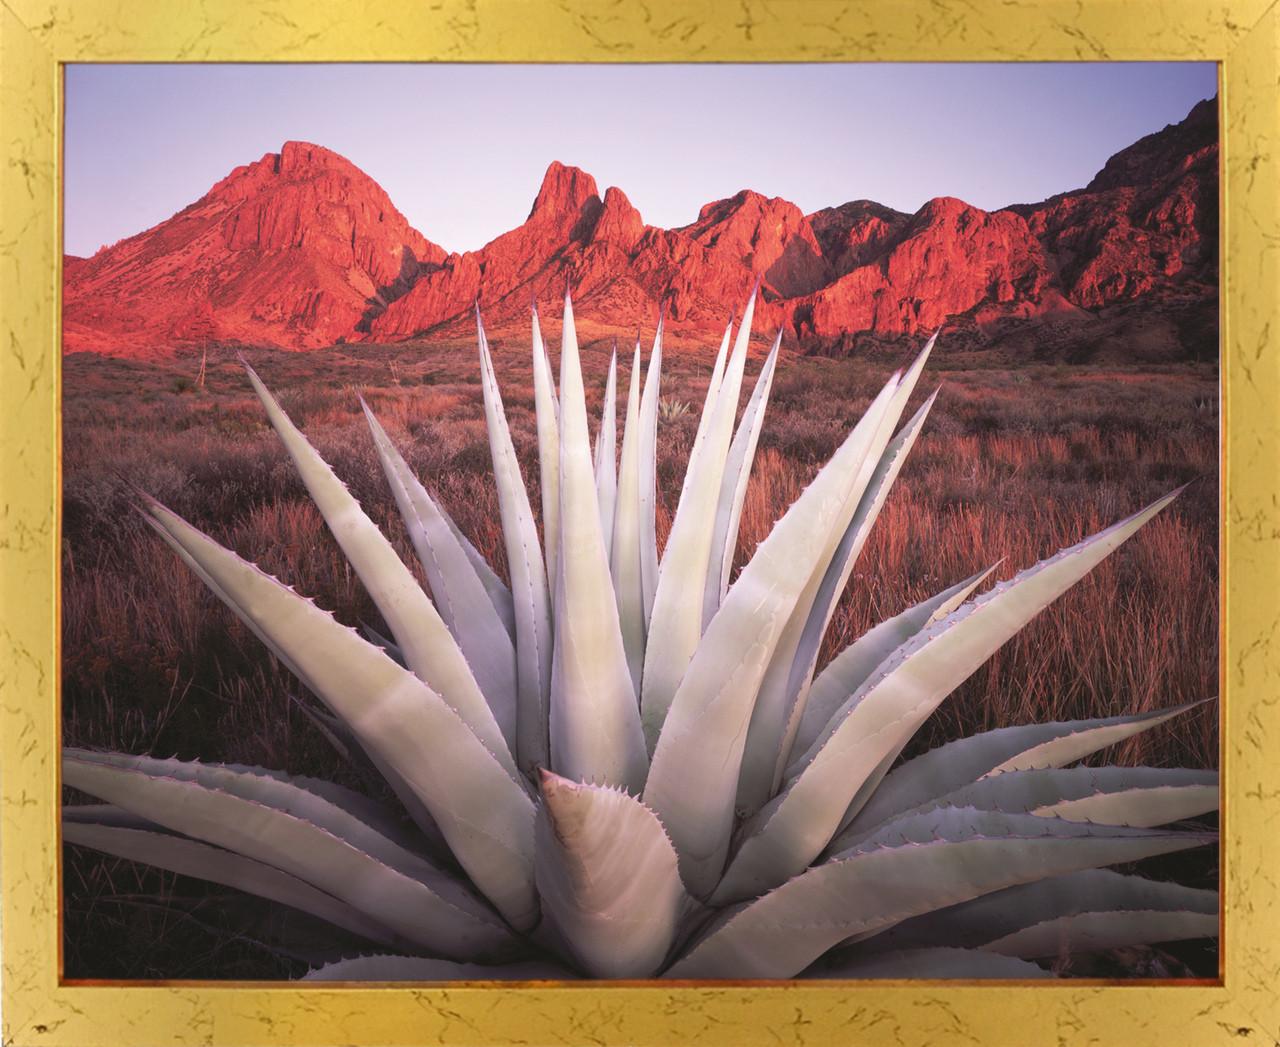 Mexico Desert Blue Agave Cactus Century Plant Art Print Poster